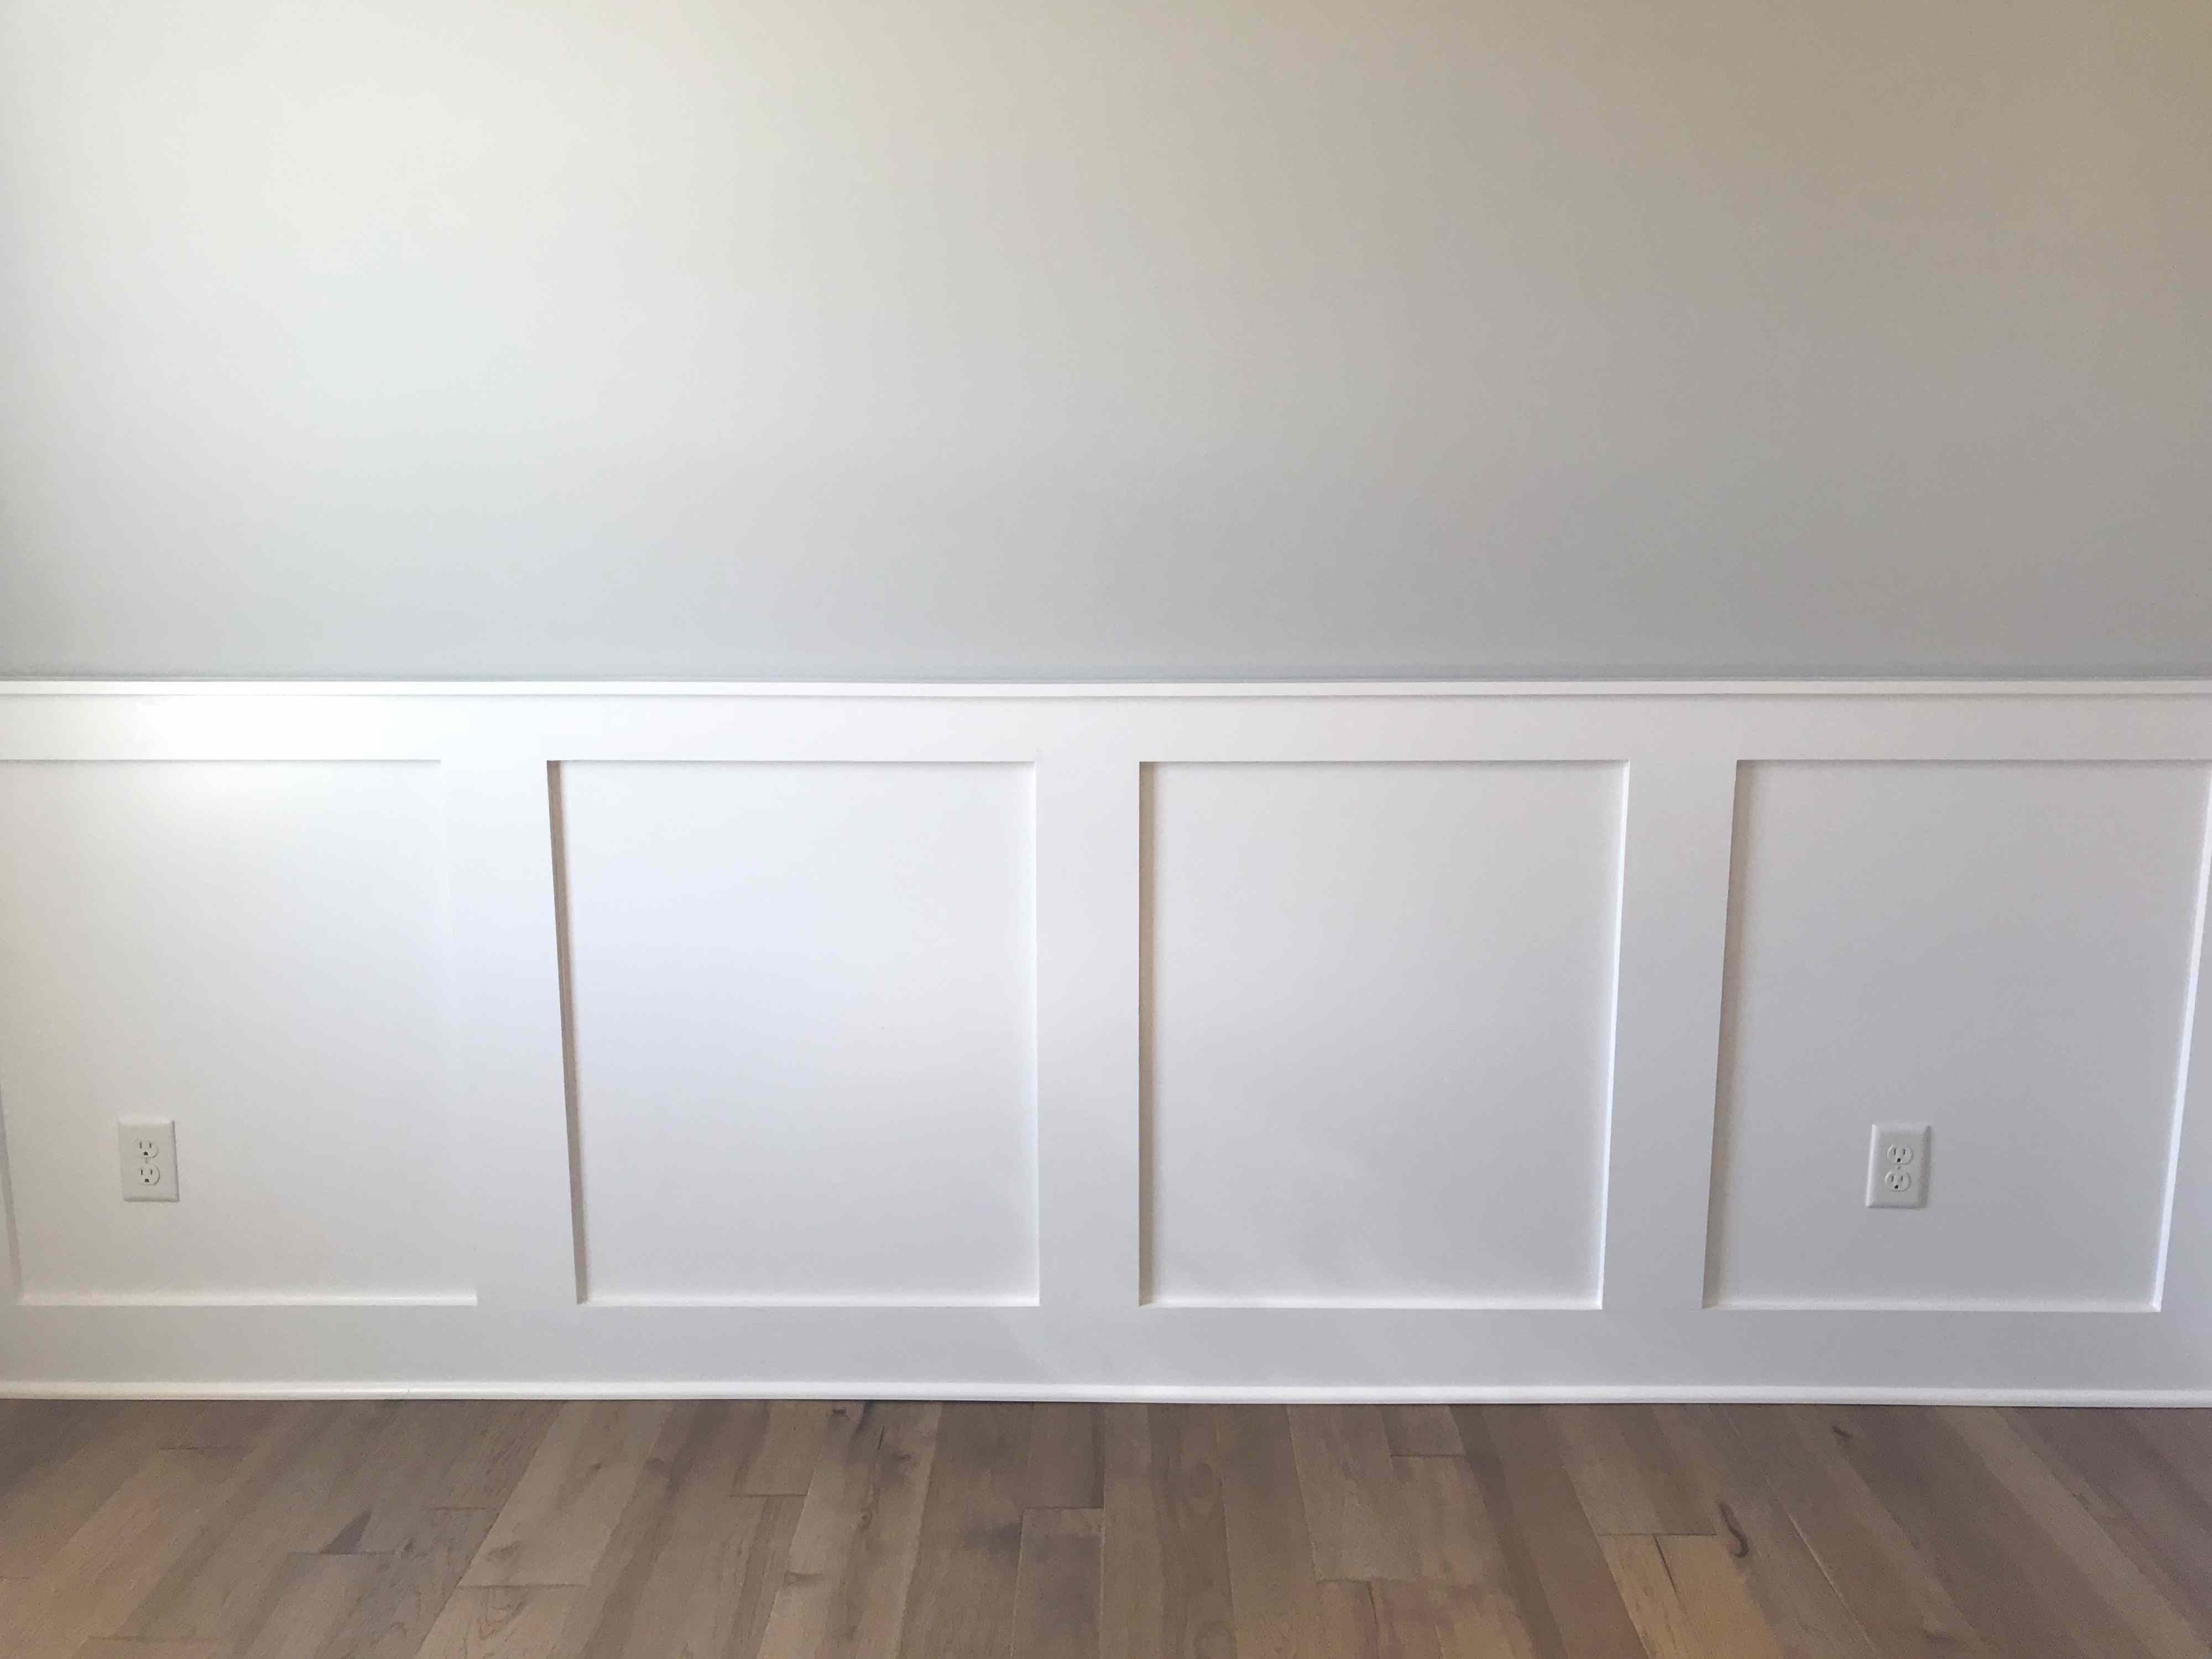 Fondo de pared de revestimiento de madera